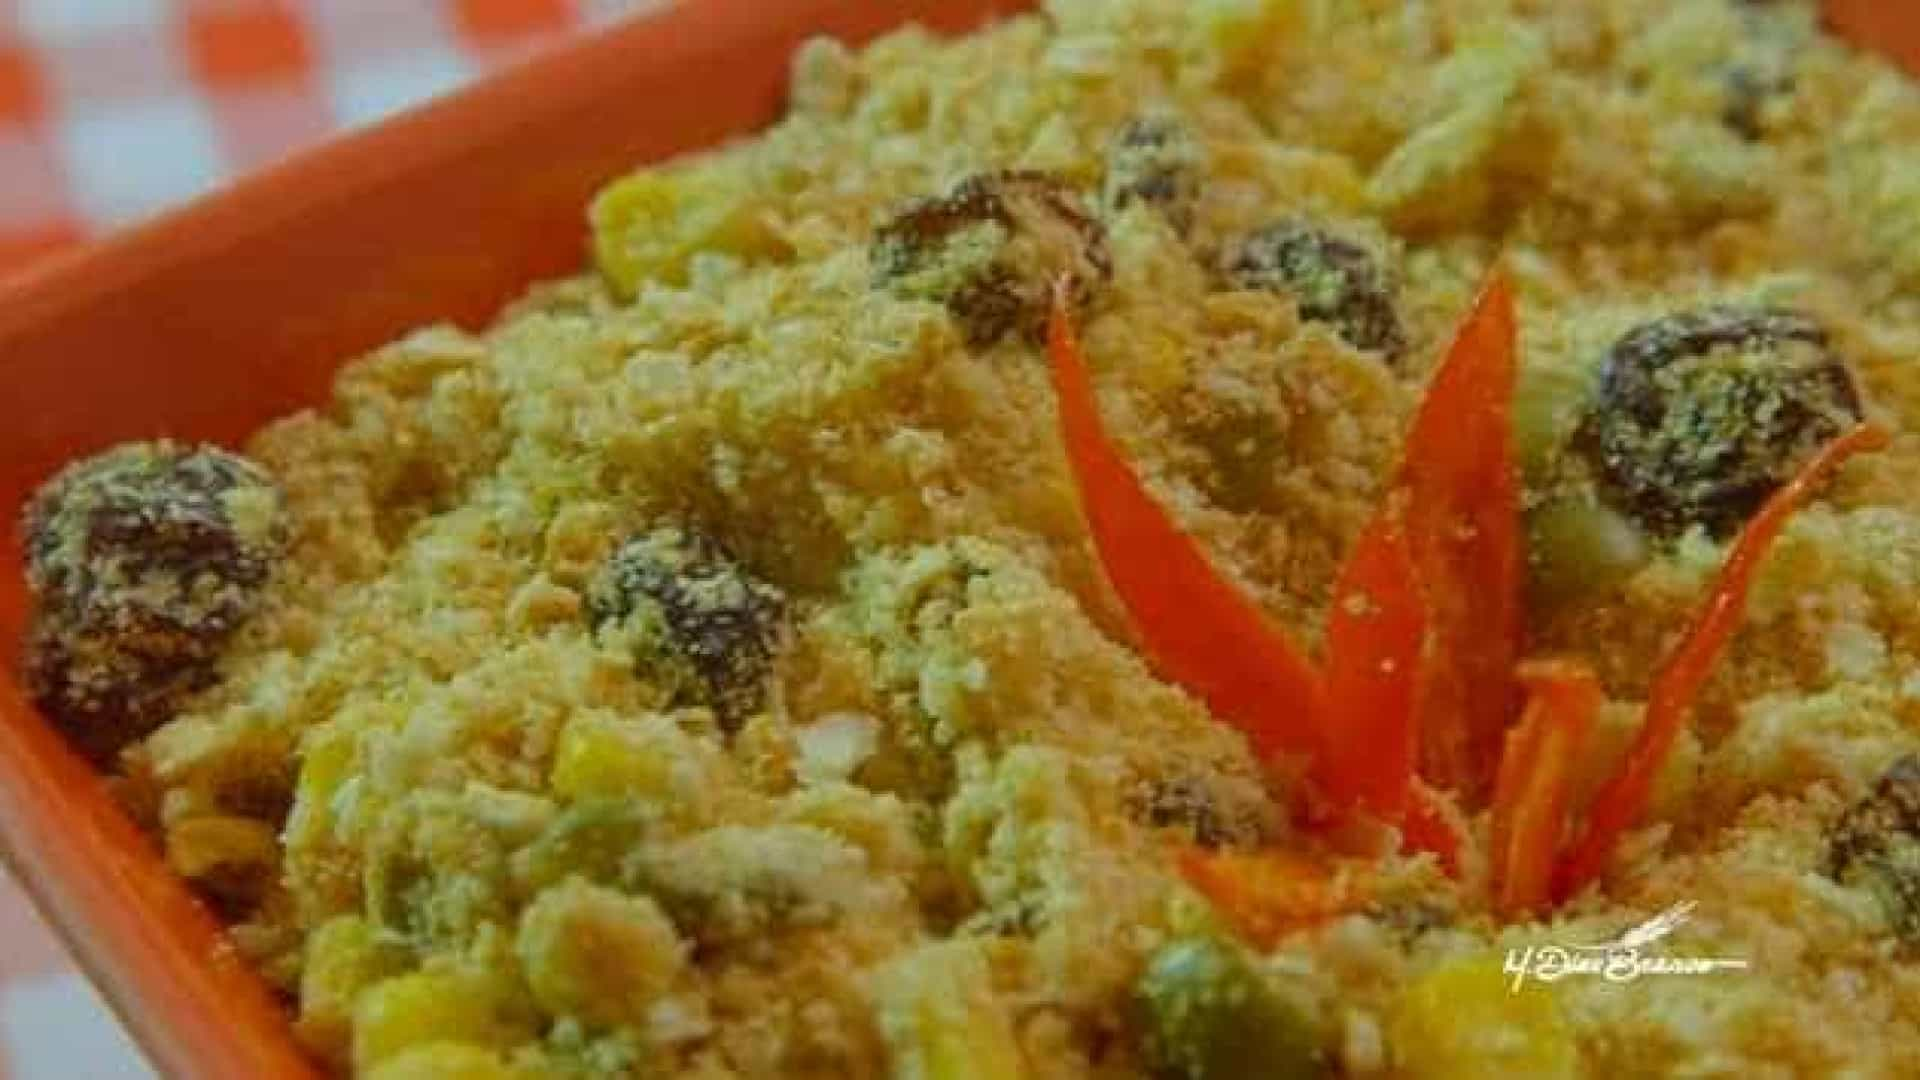 Entre no clima do Natal com deliciosa receita de farofa